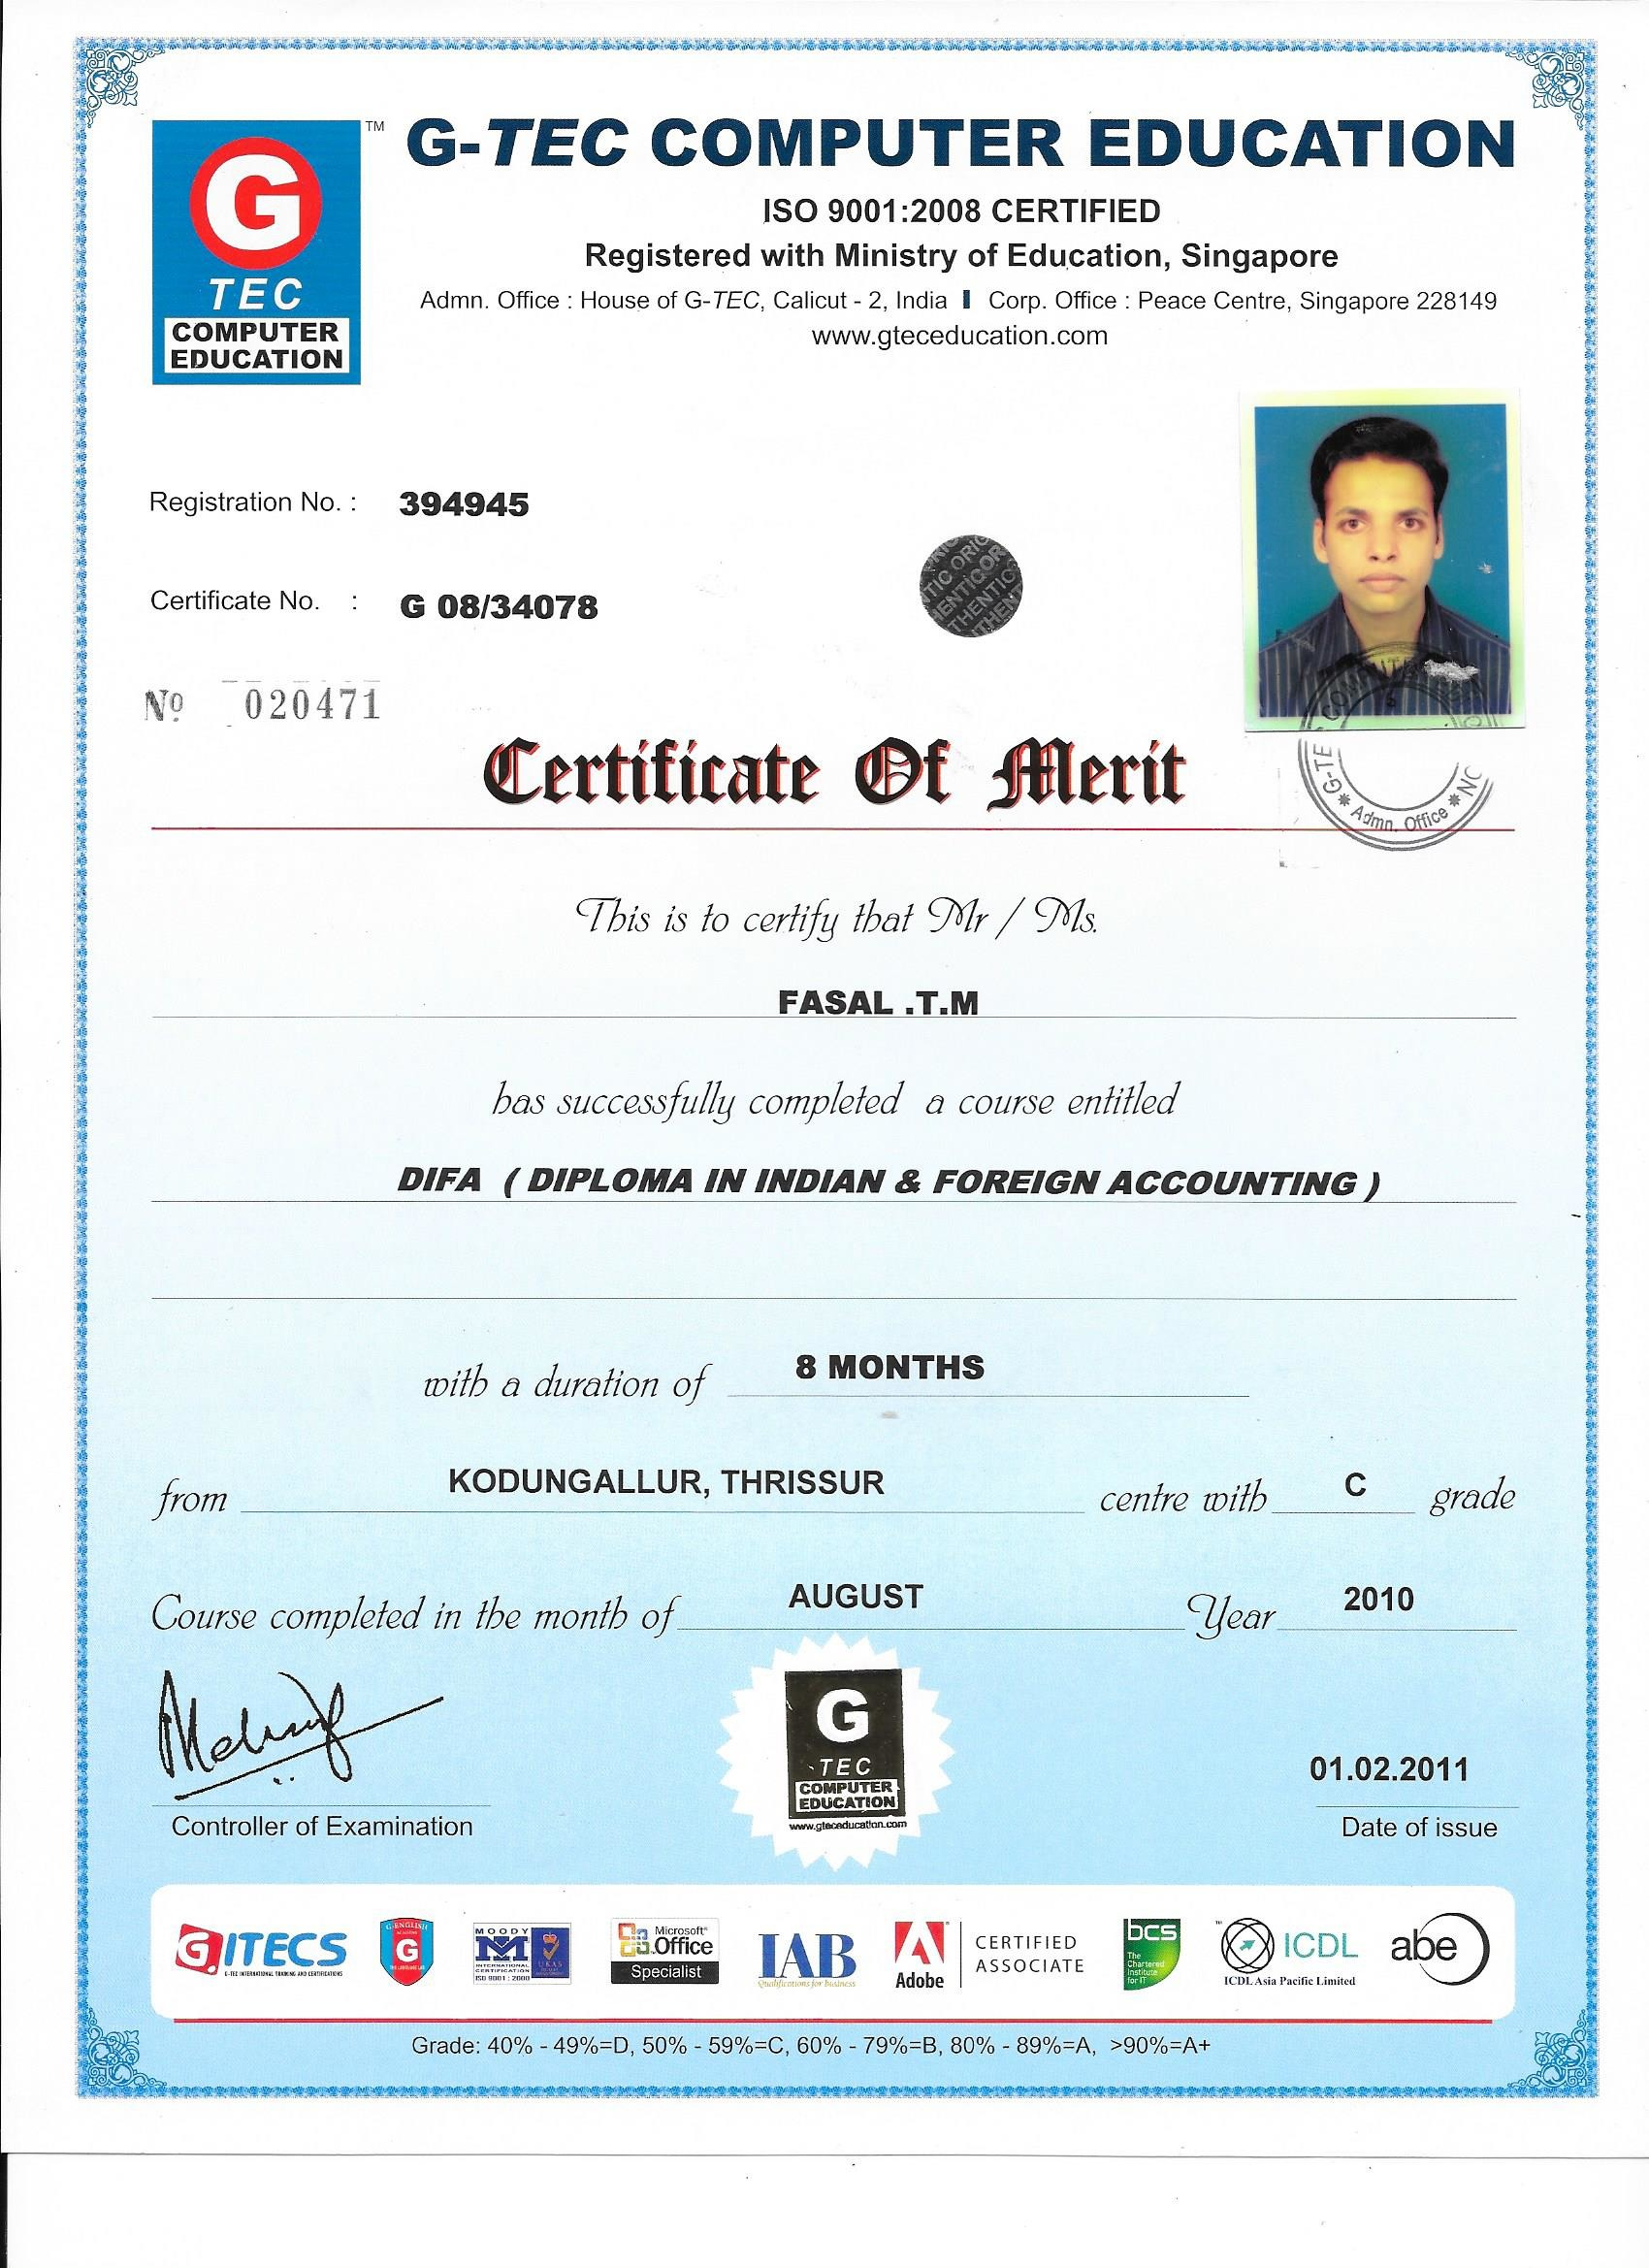 gtec computer education courses  Mohamed Fasal TM - Bayt.com